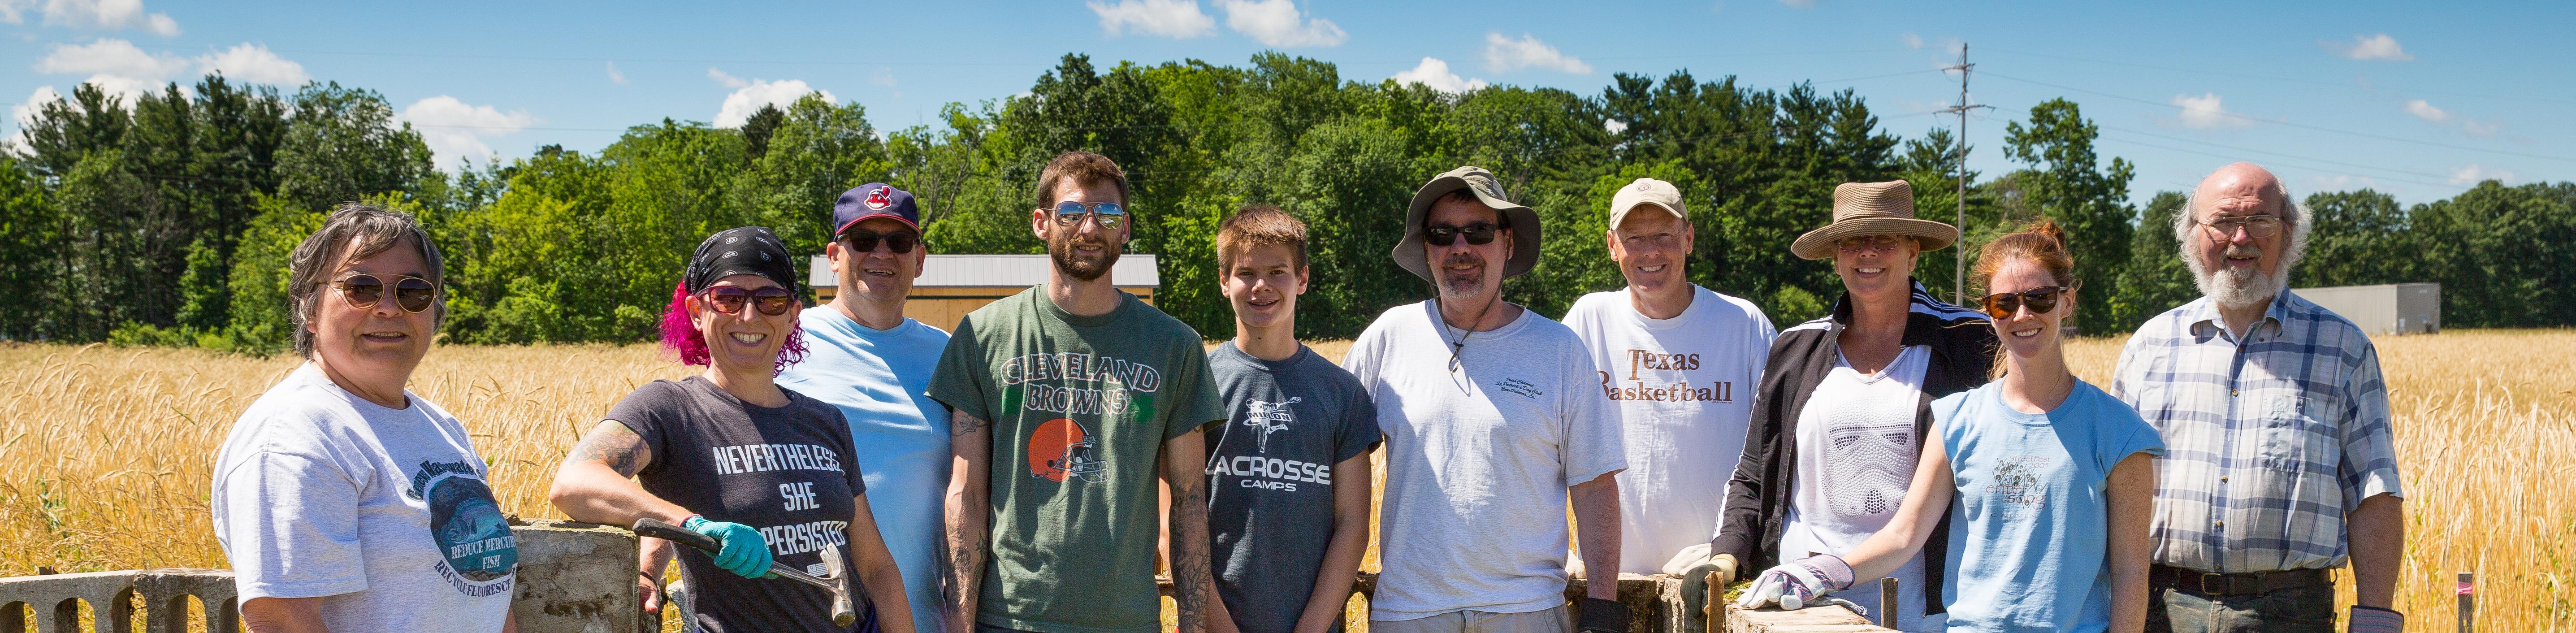 Friends of Bellwether Farm